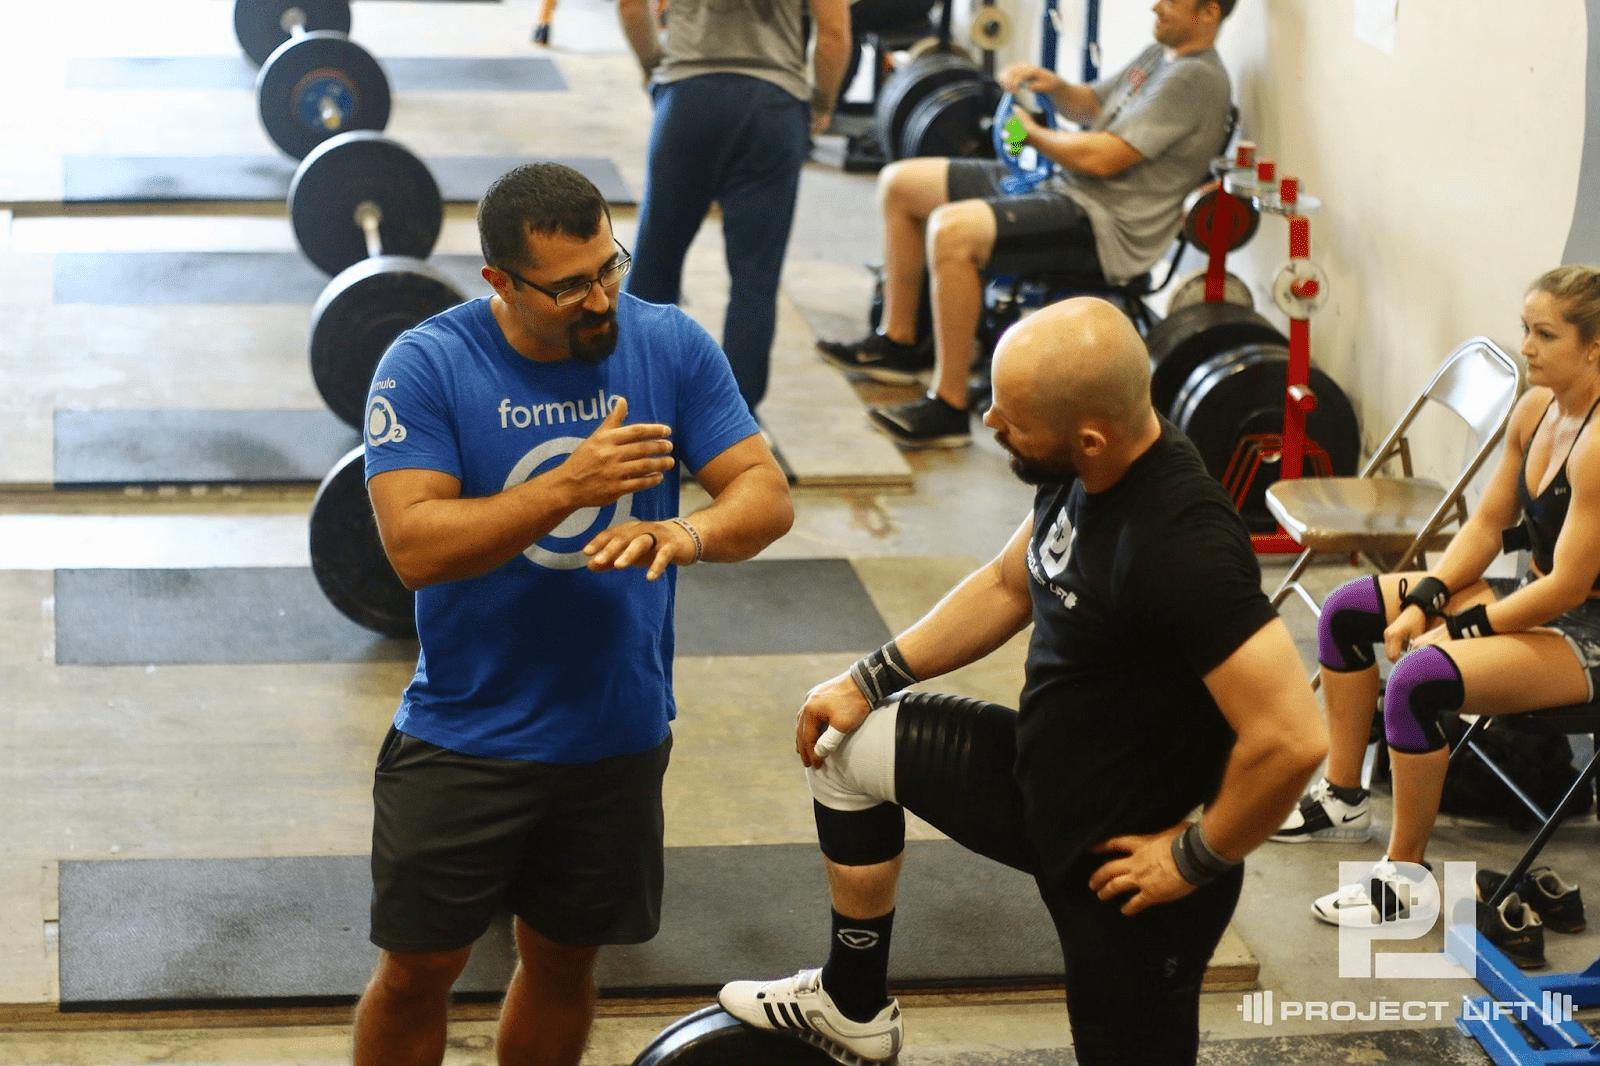 Men discussing lifting at gym